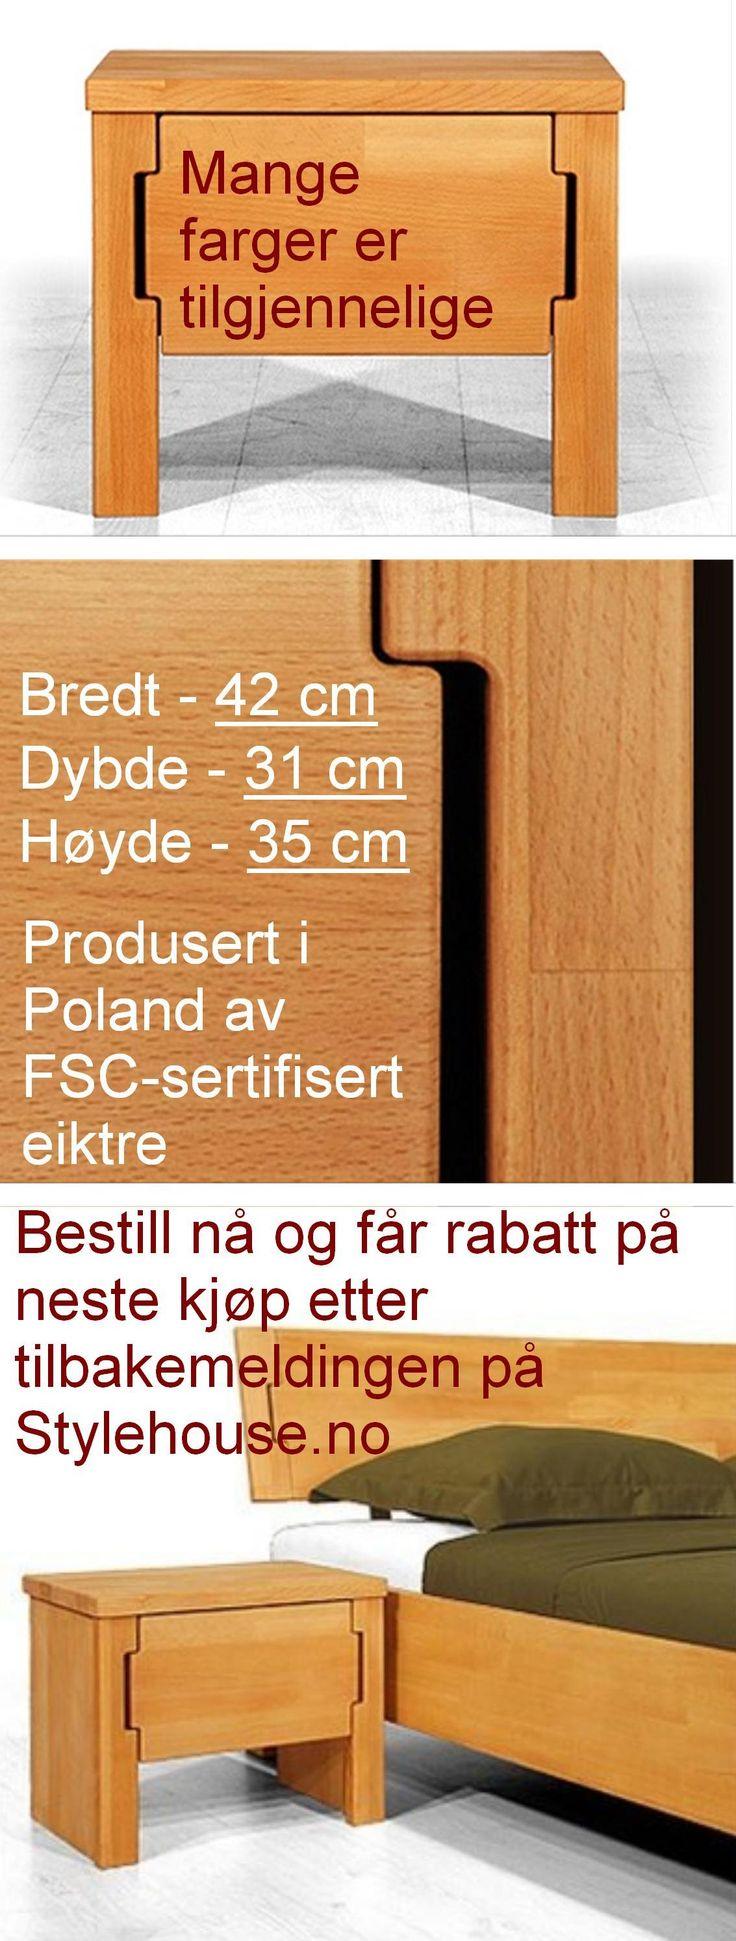 #nattbord #eiknattbord #heltrenattbord #FSCheltrenattbord #FSCnattbord #FSCbord #FSCmøbler #FSCsertifisert #FSC-sertifisert #TheBeds #TheBedsnattbord #TheBedsnighttable